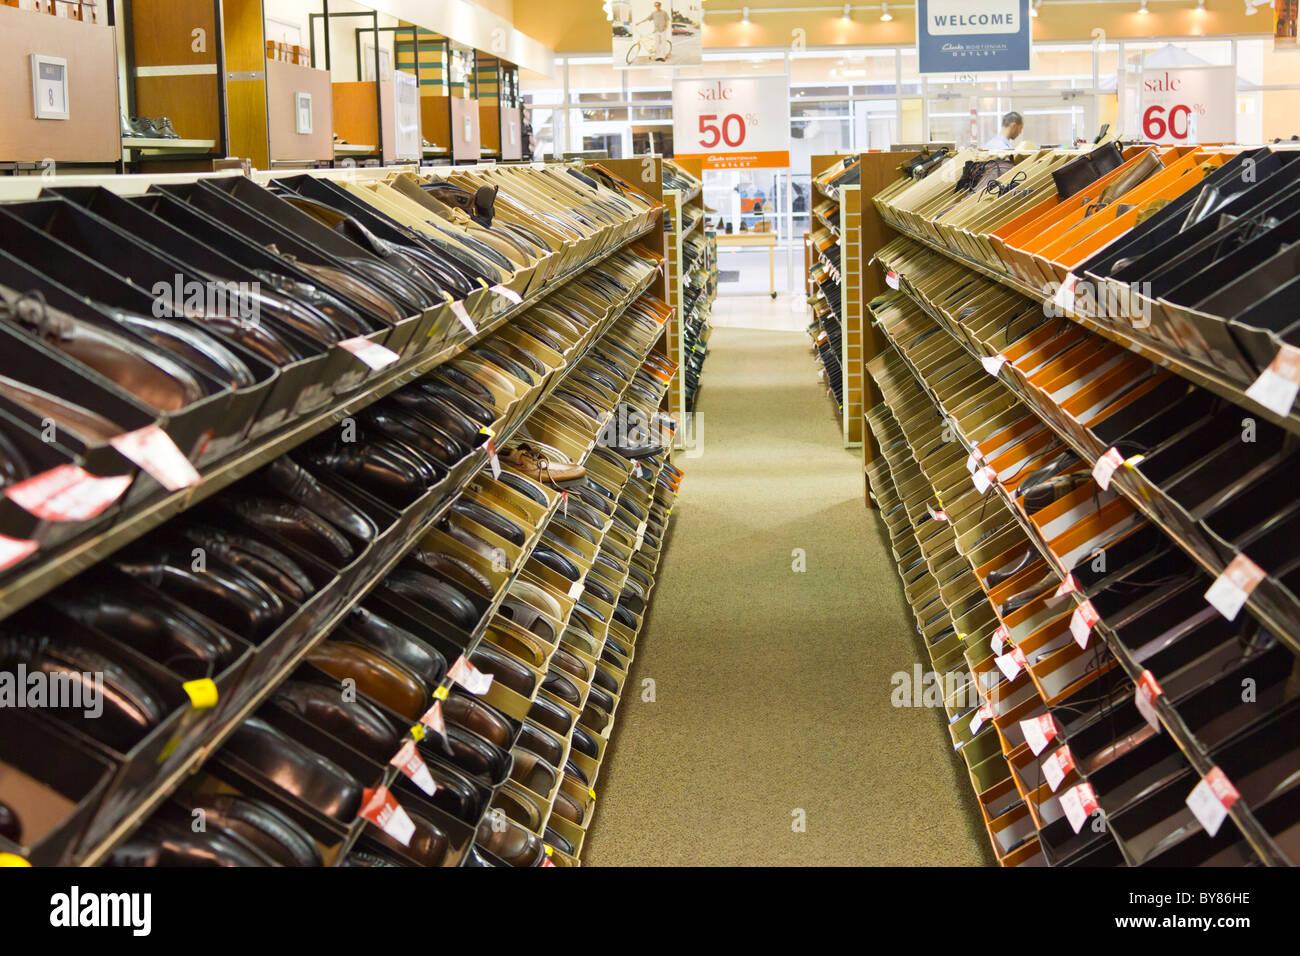 636f7487d2d12b Clarks outlet store